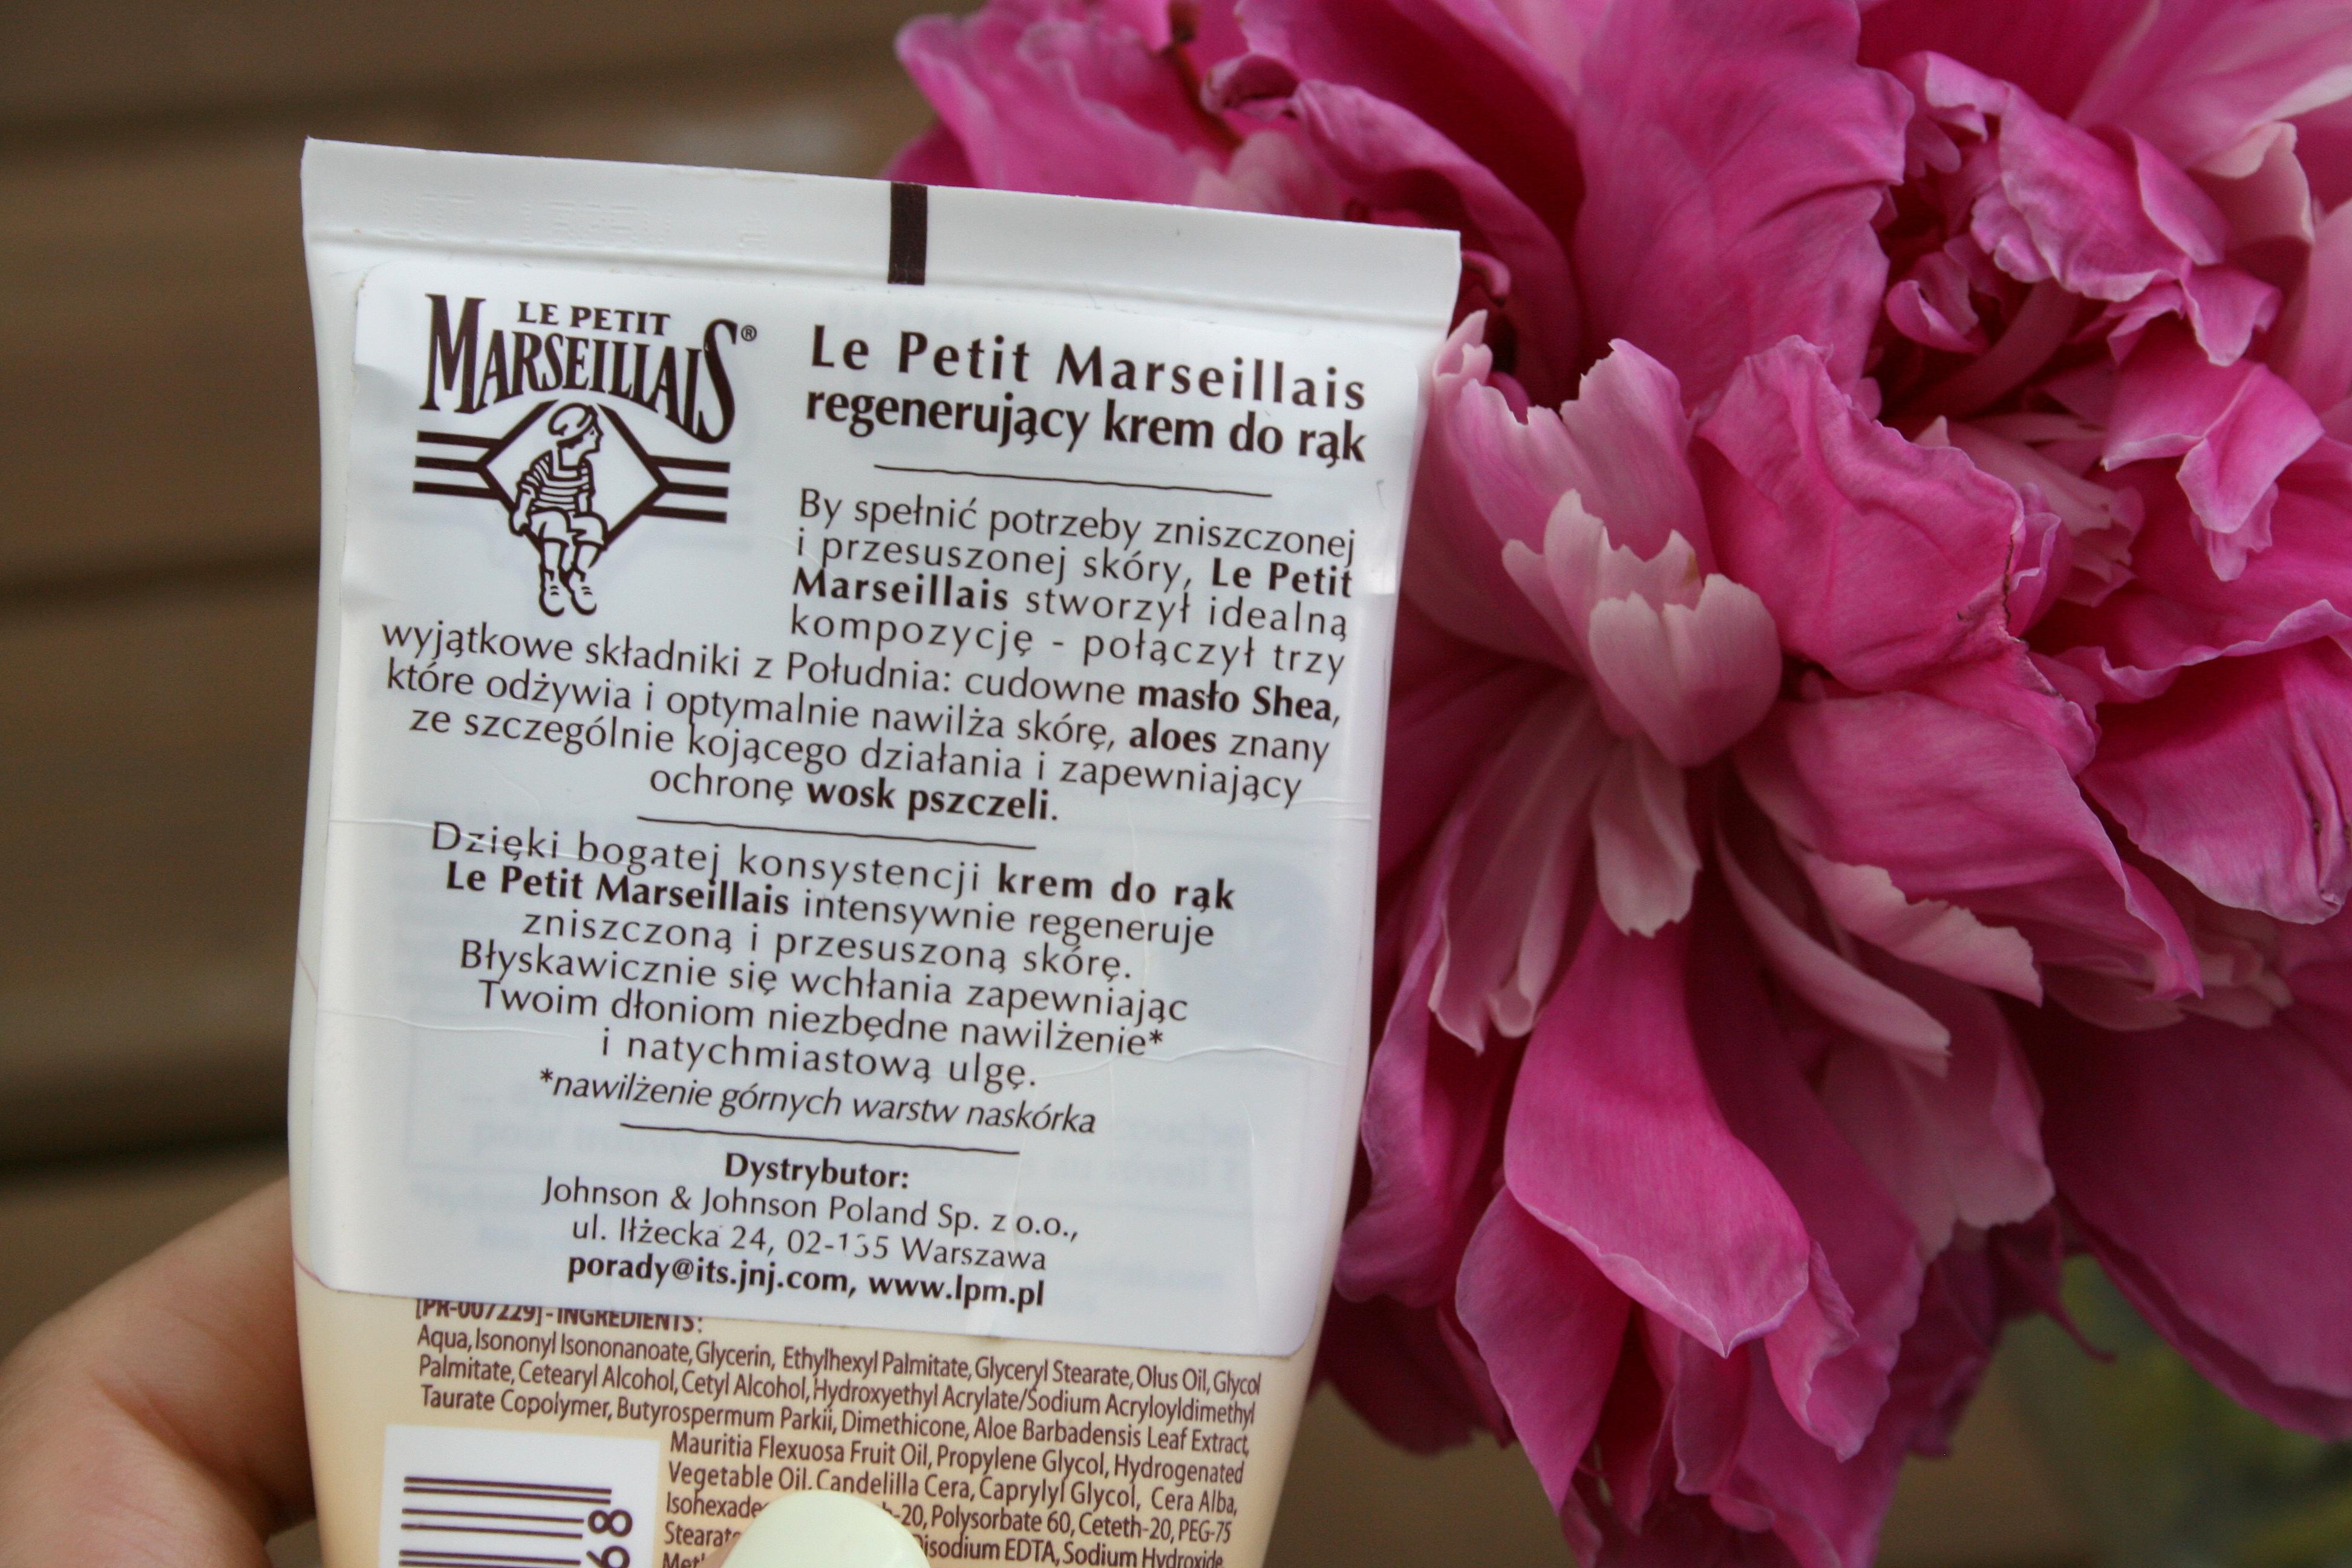 Regenerujący krem do rąk Le Petit Marseillais